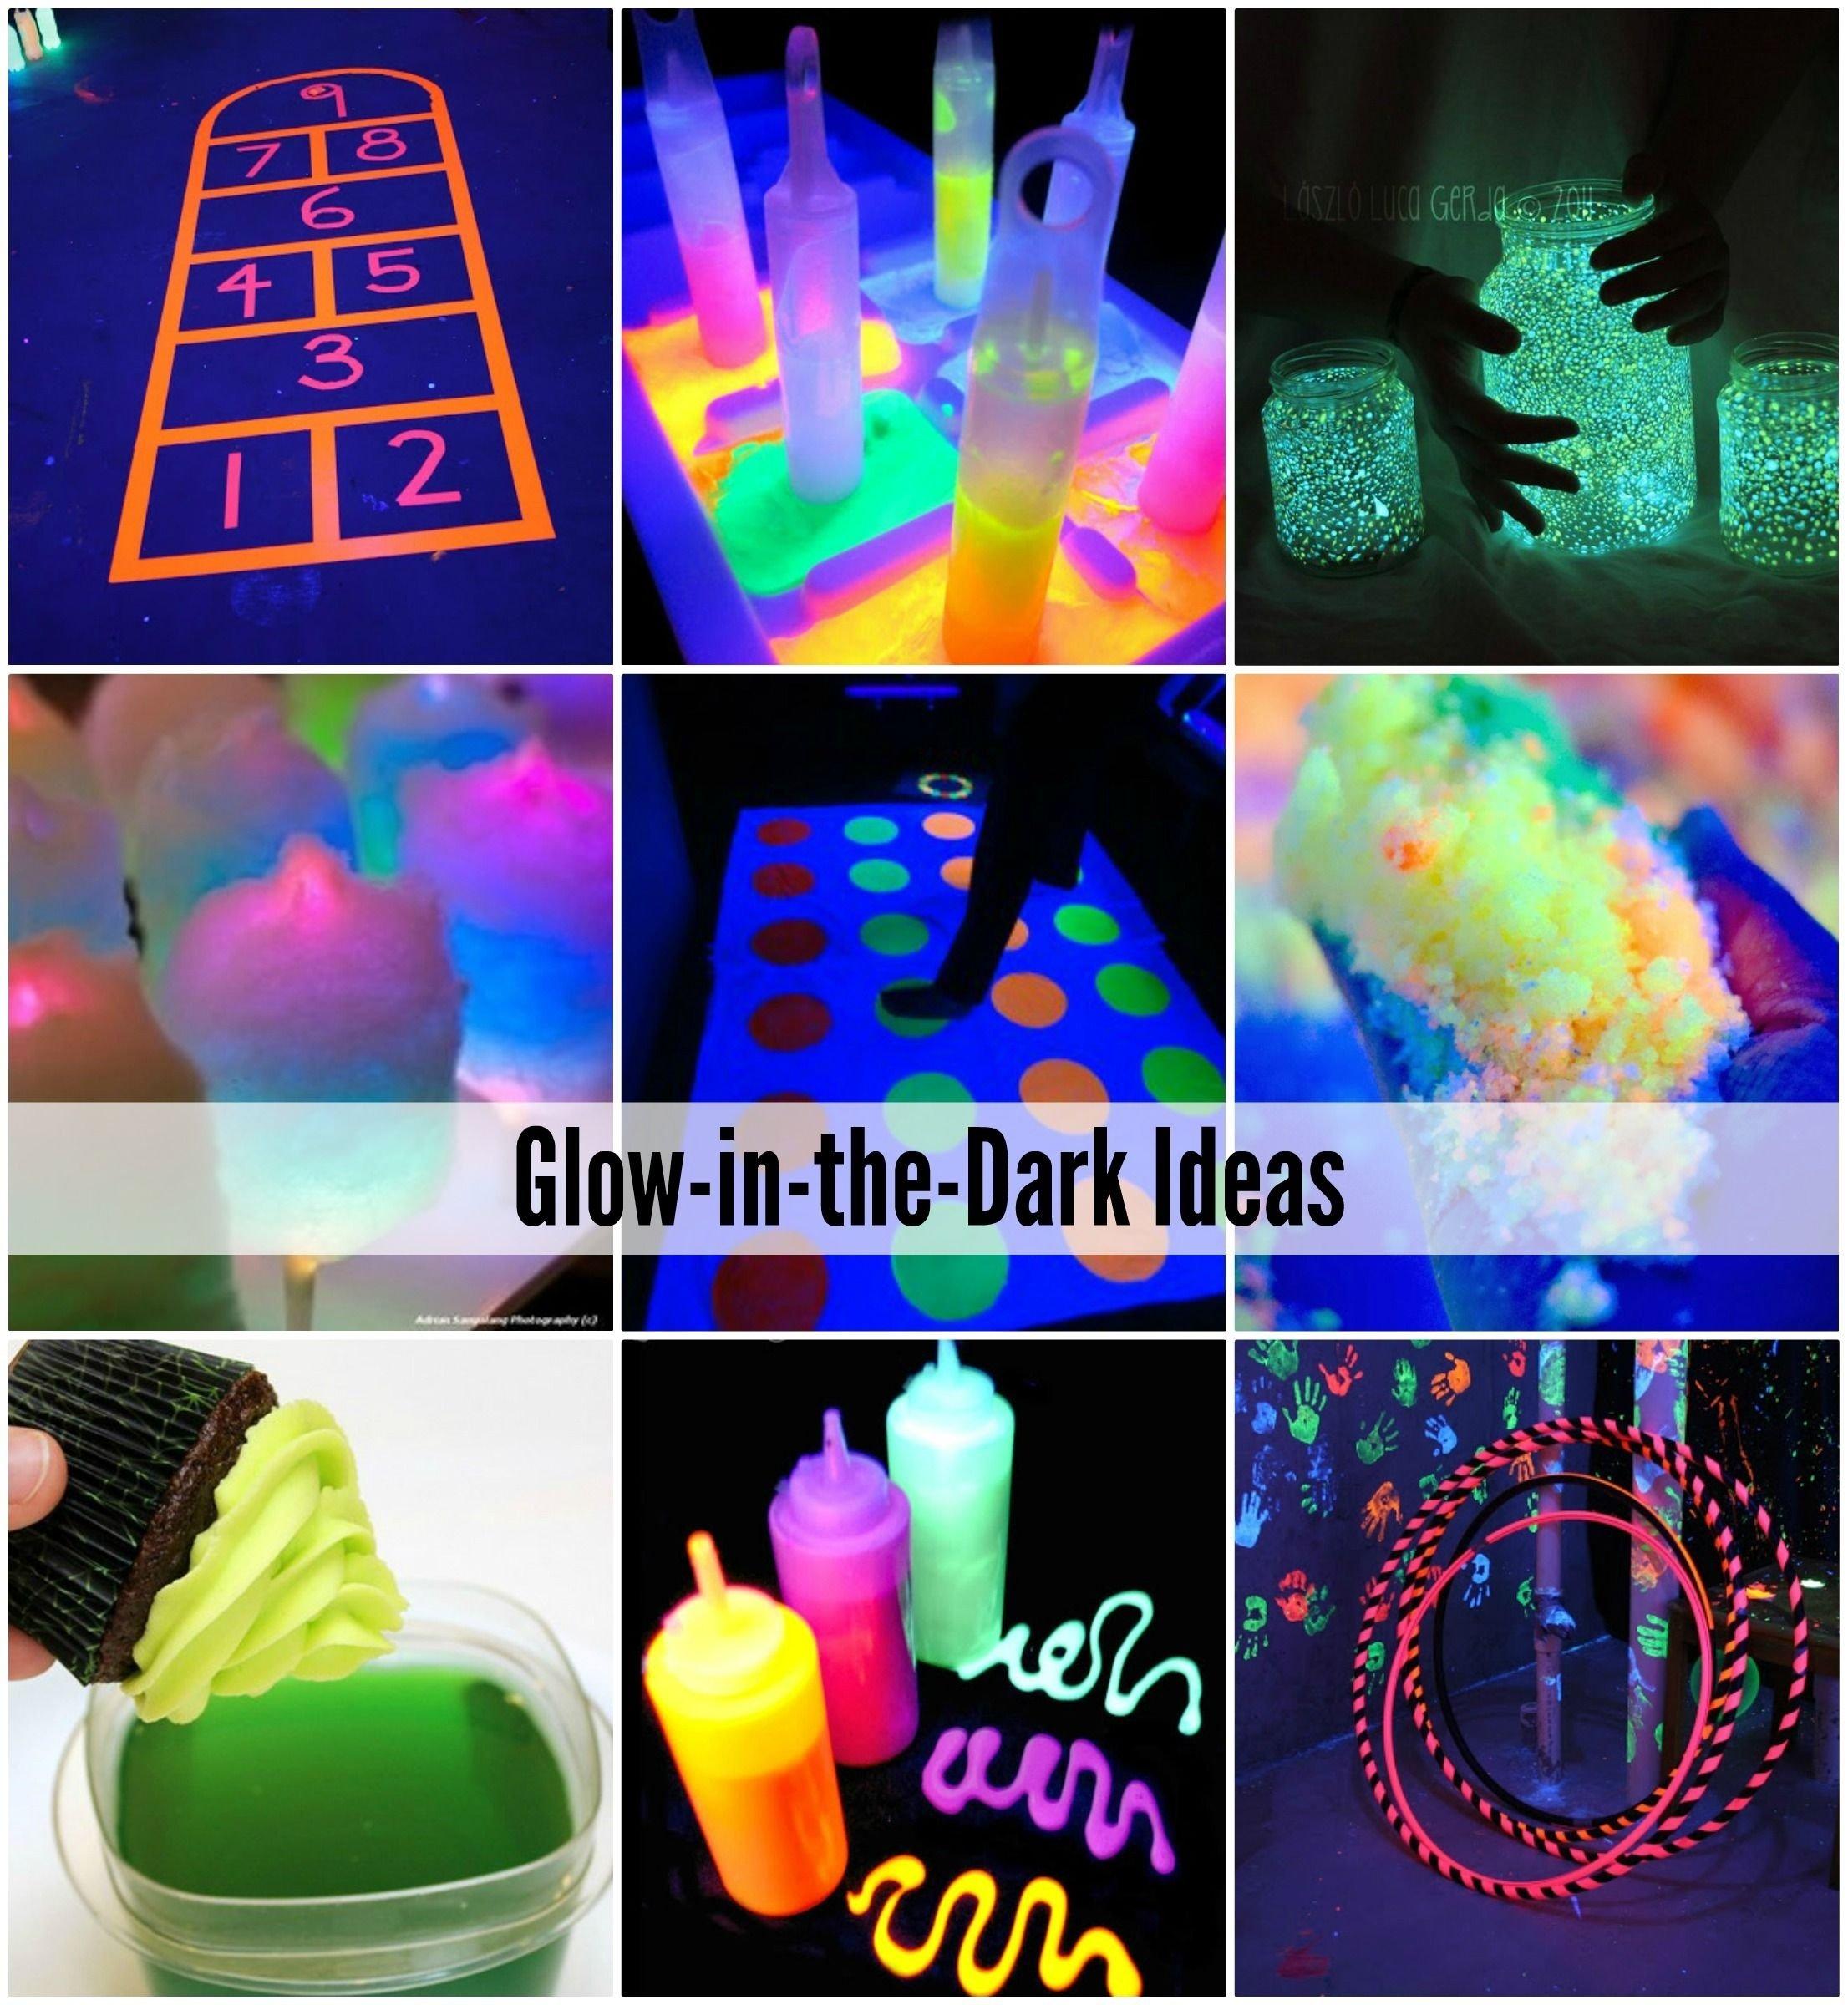 glow-in-the-dark games, activities and food | fêtes, activité et fluo